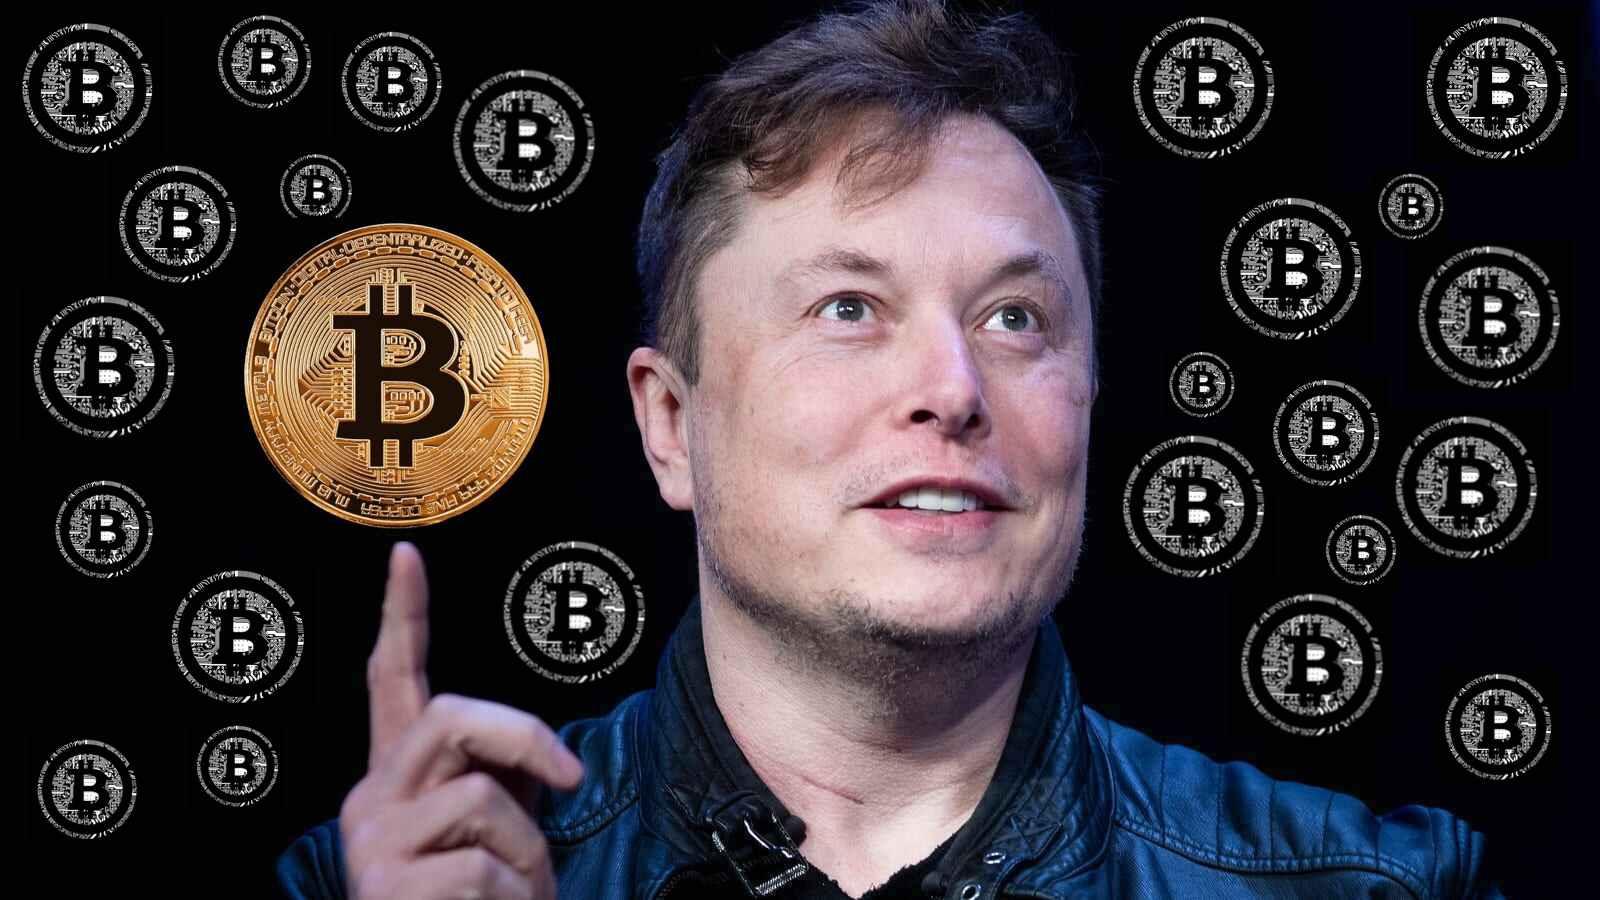 Elon Musk stirred up the crypto market again